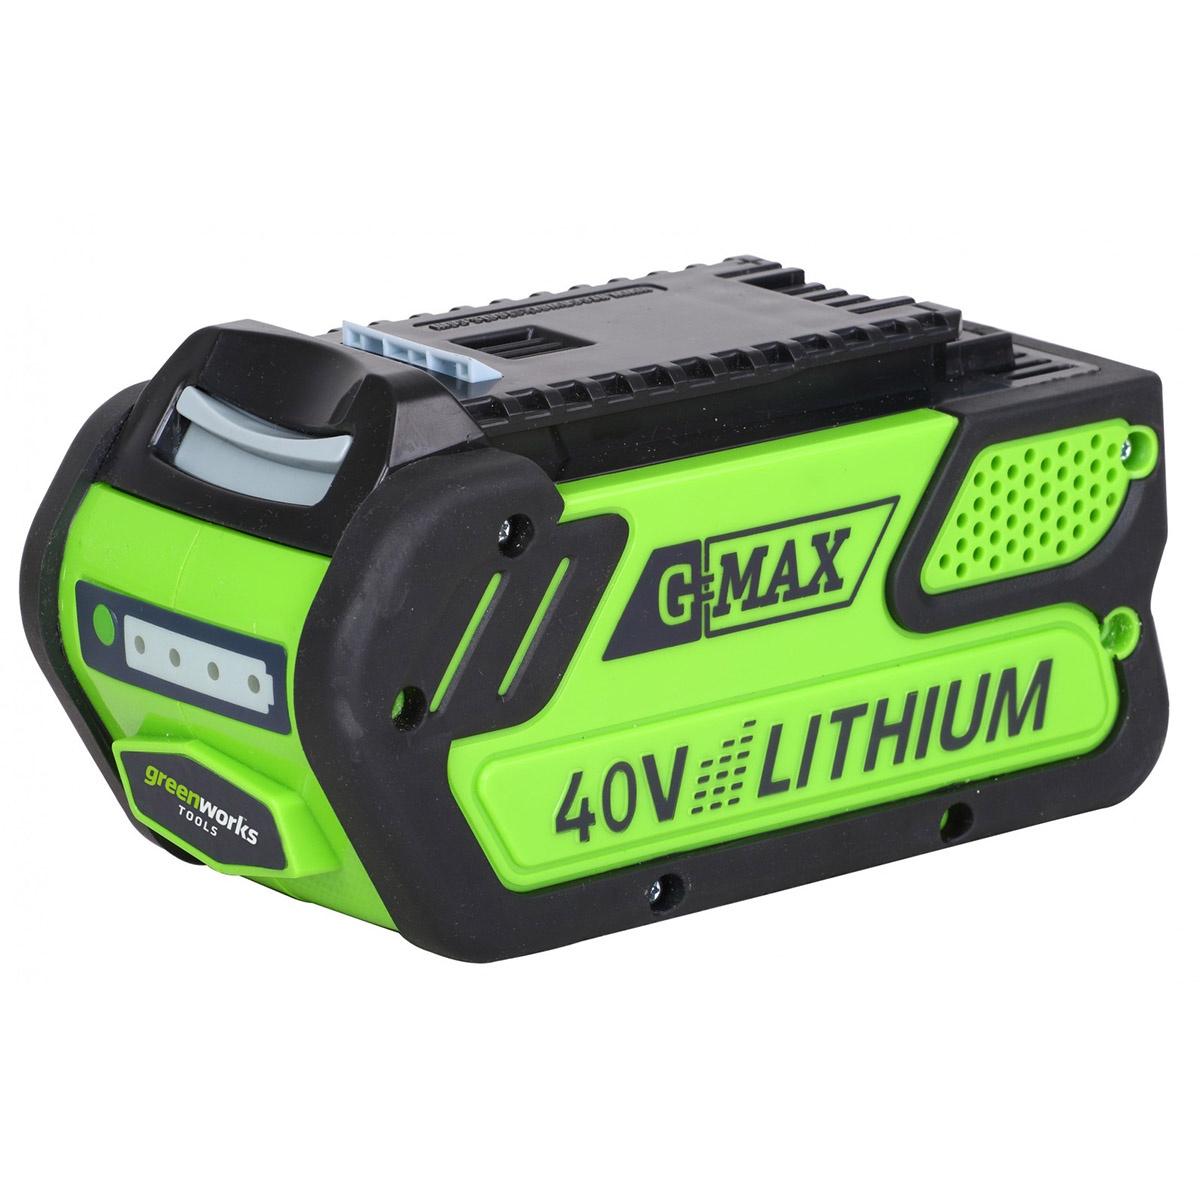 Аккумулятор для инструмента Greenworks G40B4 40V, 4 А.ч пильная цепь greenworks 40v 40 см